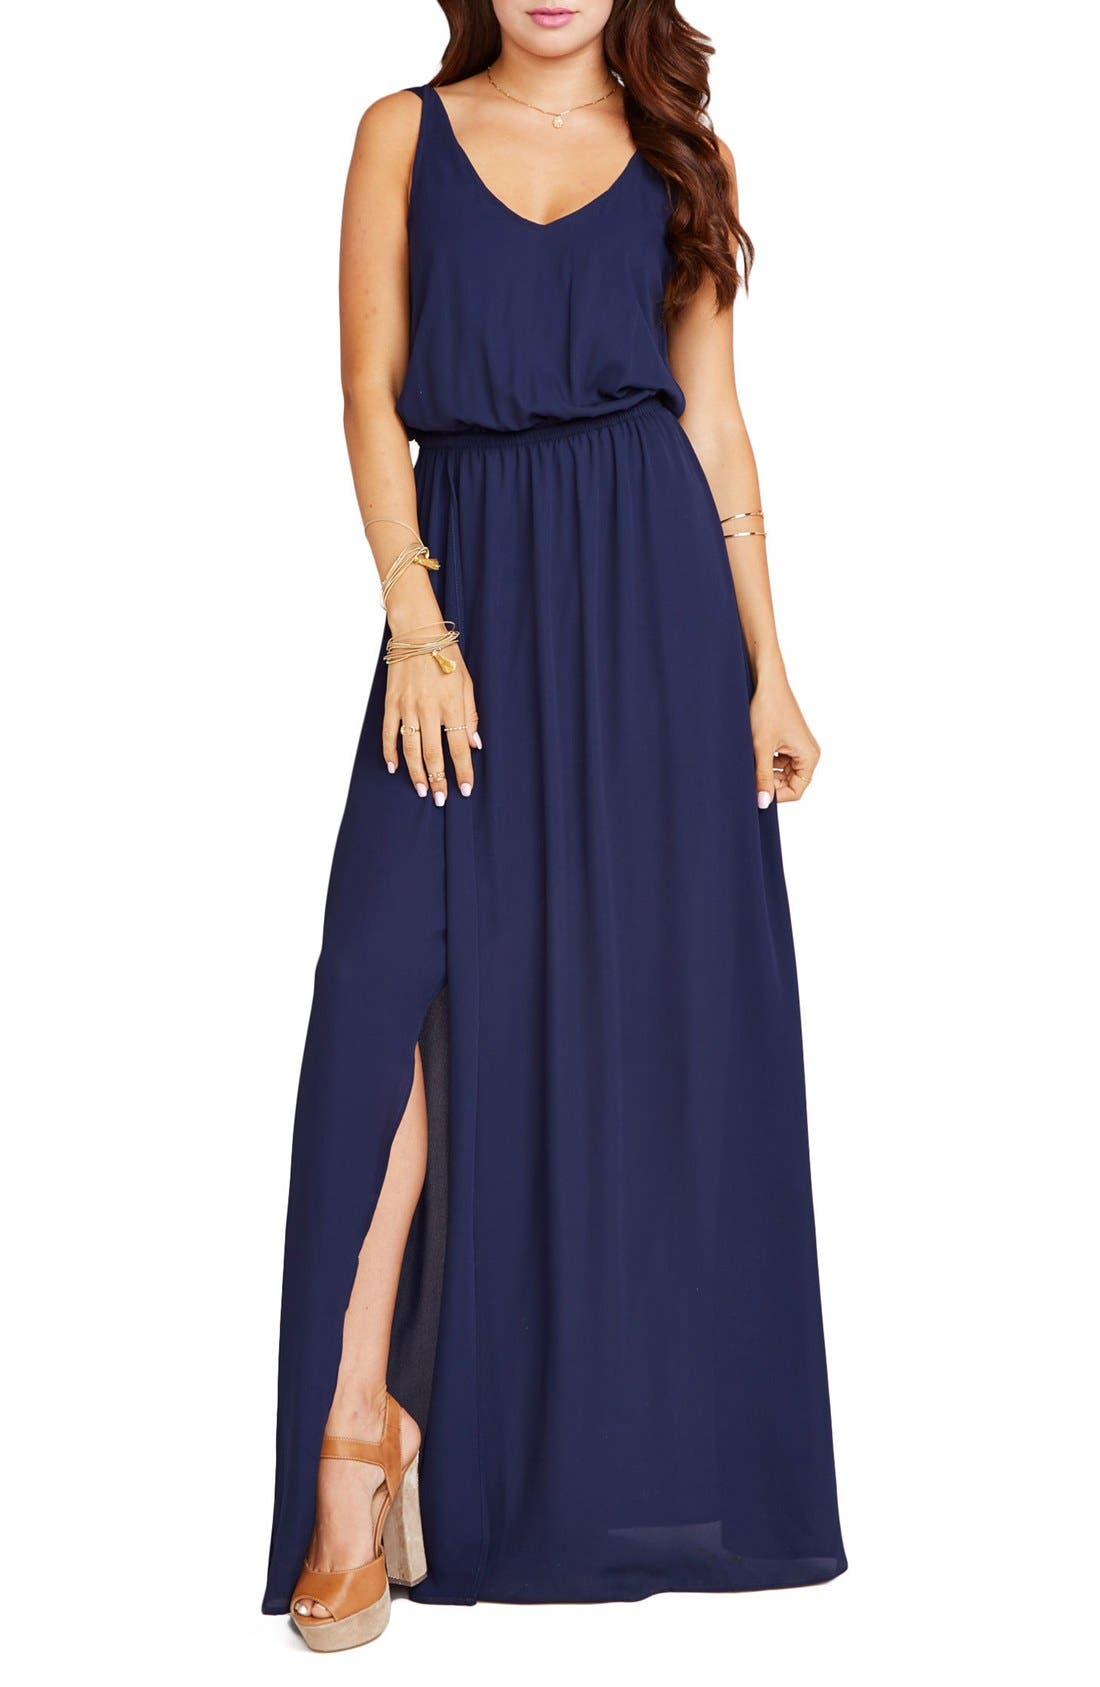 Main Image - Show Me Your Mumu Kendall Soft V-Back A-Line Gown